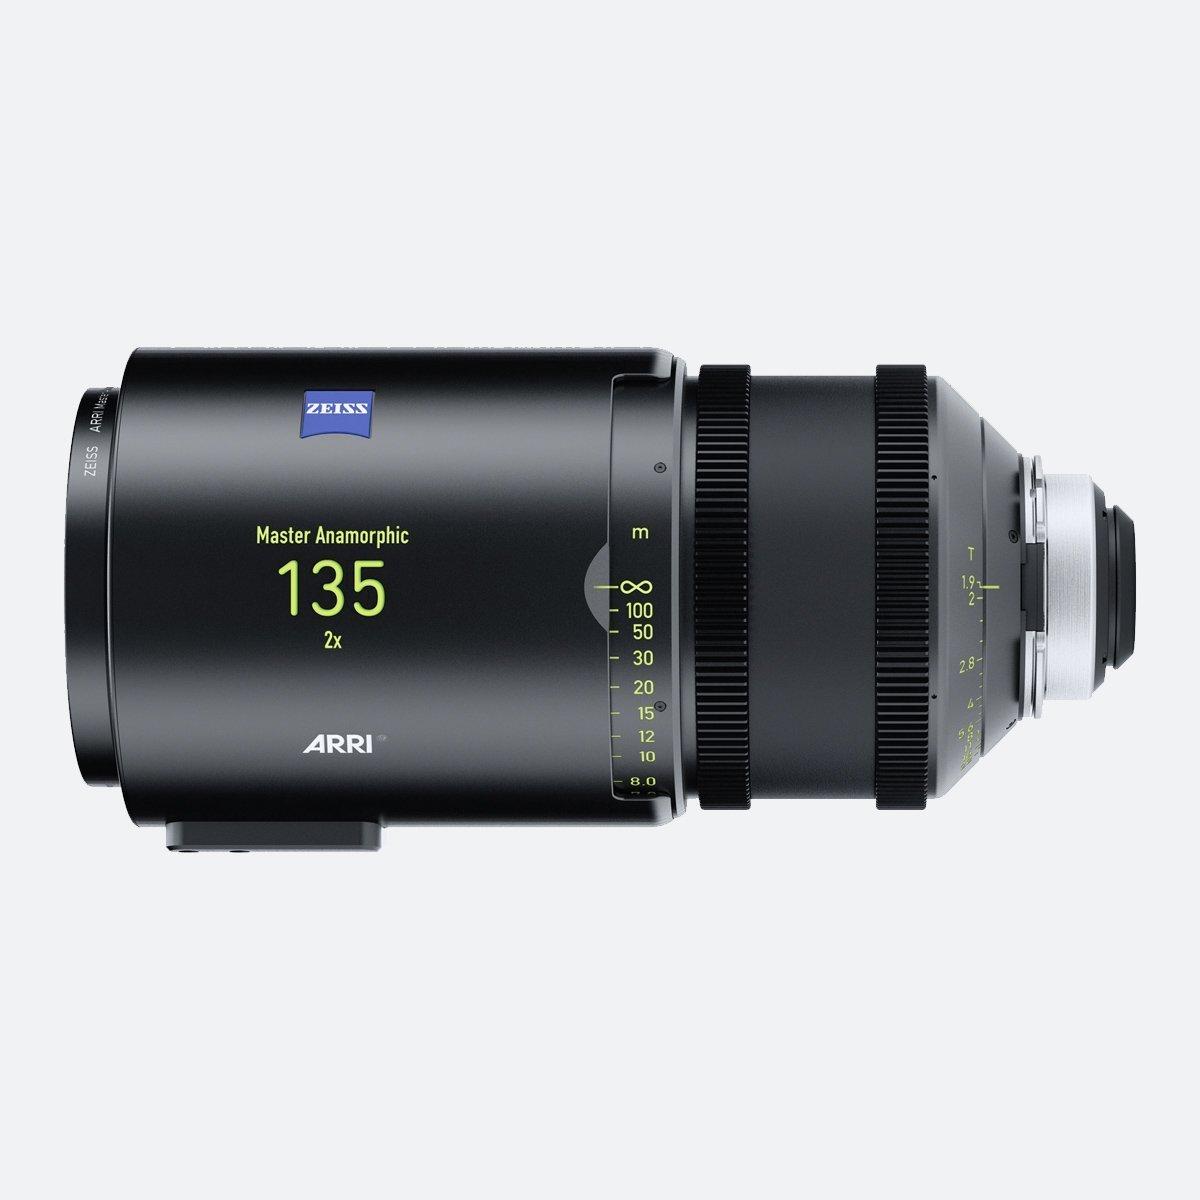 ARRI 135mm T1.9 Master Anamorphic Lens